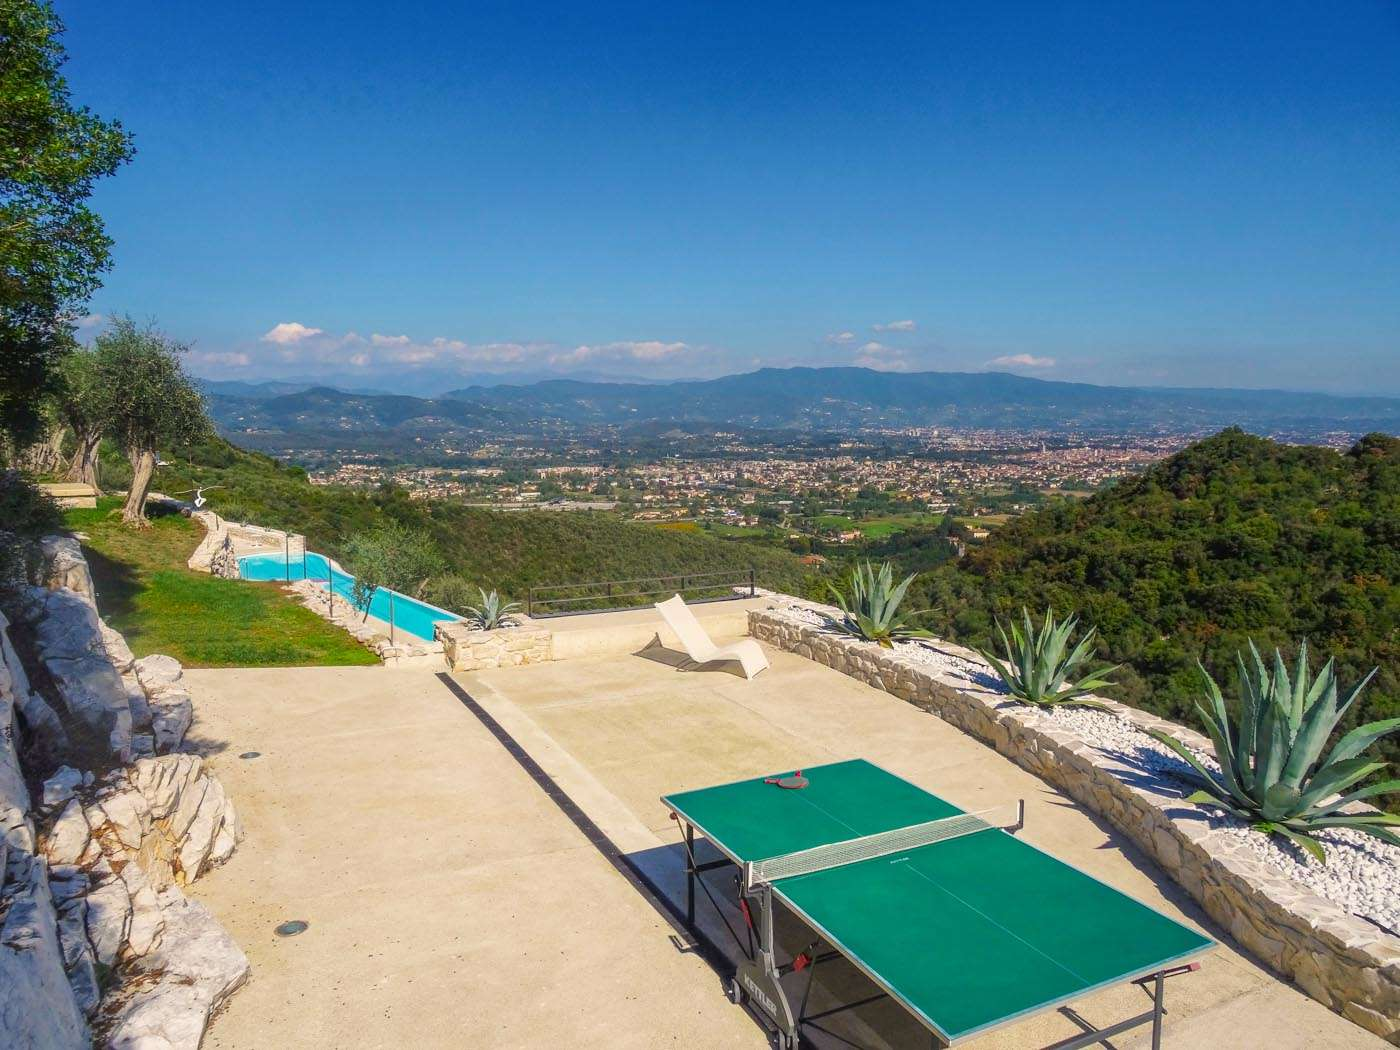 Luxury vacation rentals europe - Italy - Tuscany - Lucca - Alata - Image 1/23